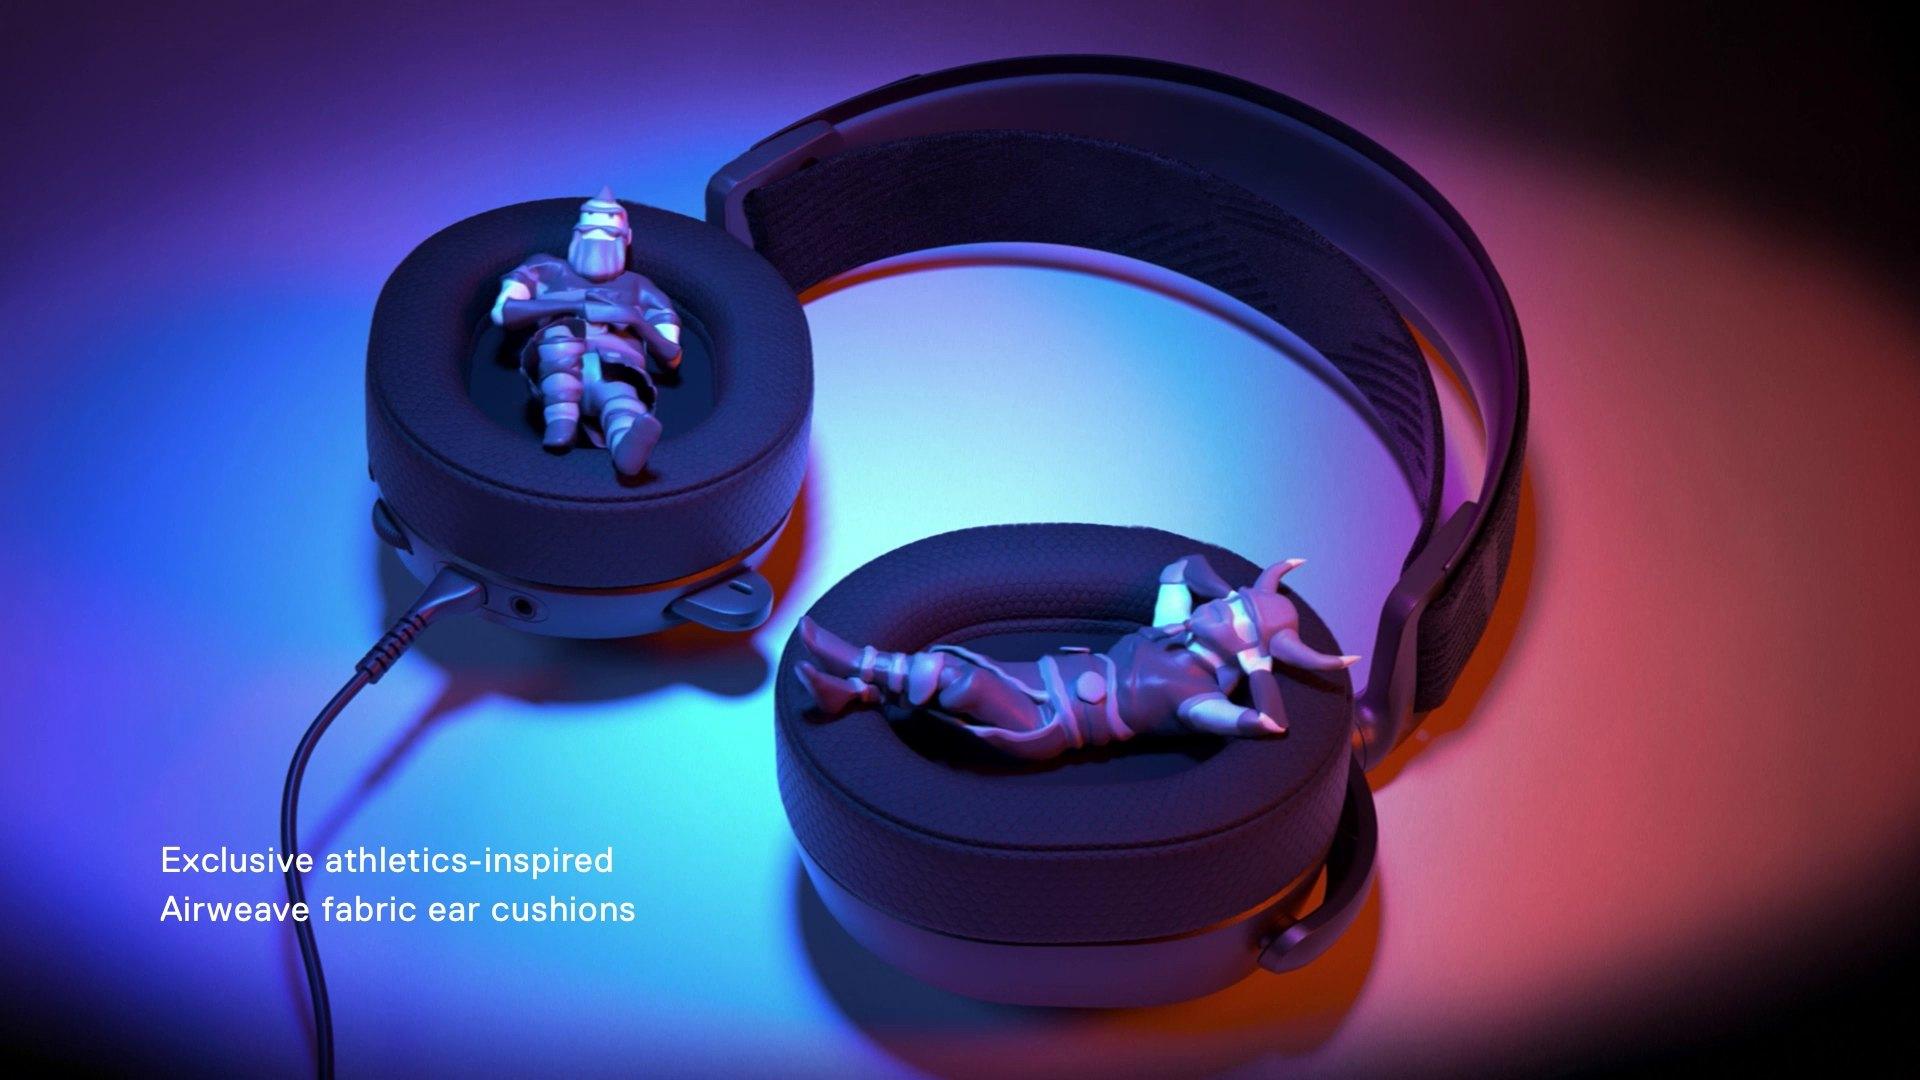 Đệm tai của Tai nghe SteelSeries Arctis Pro+GameDAC 61453